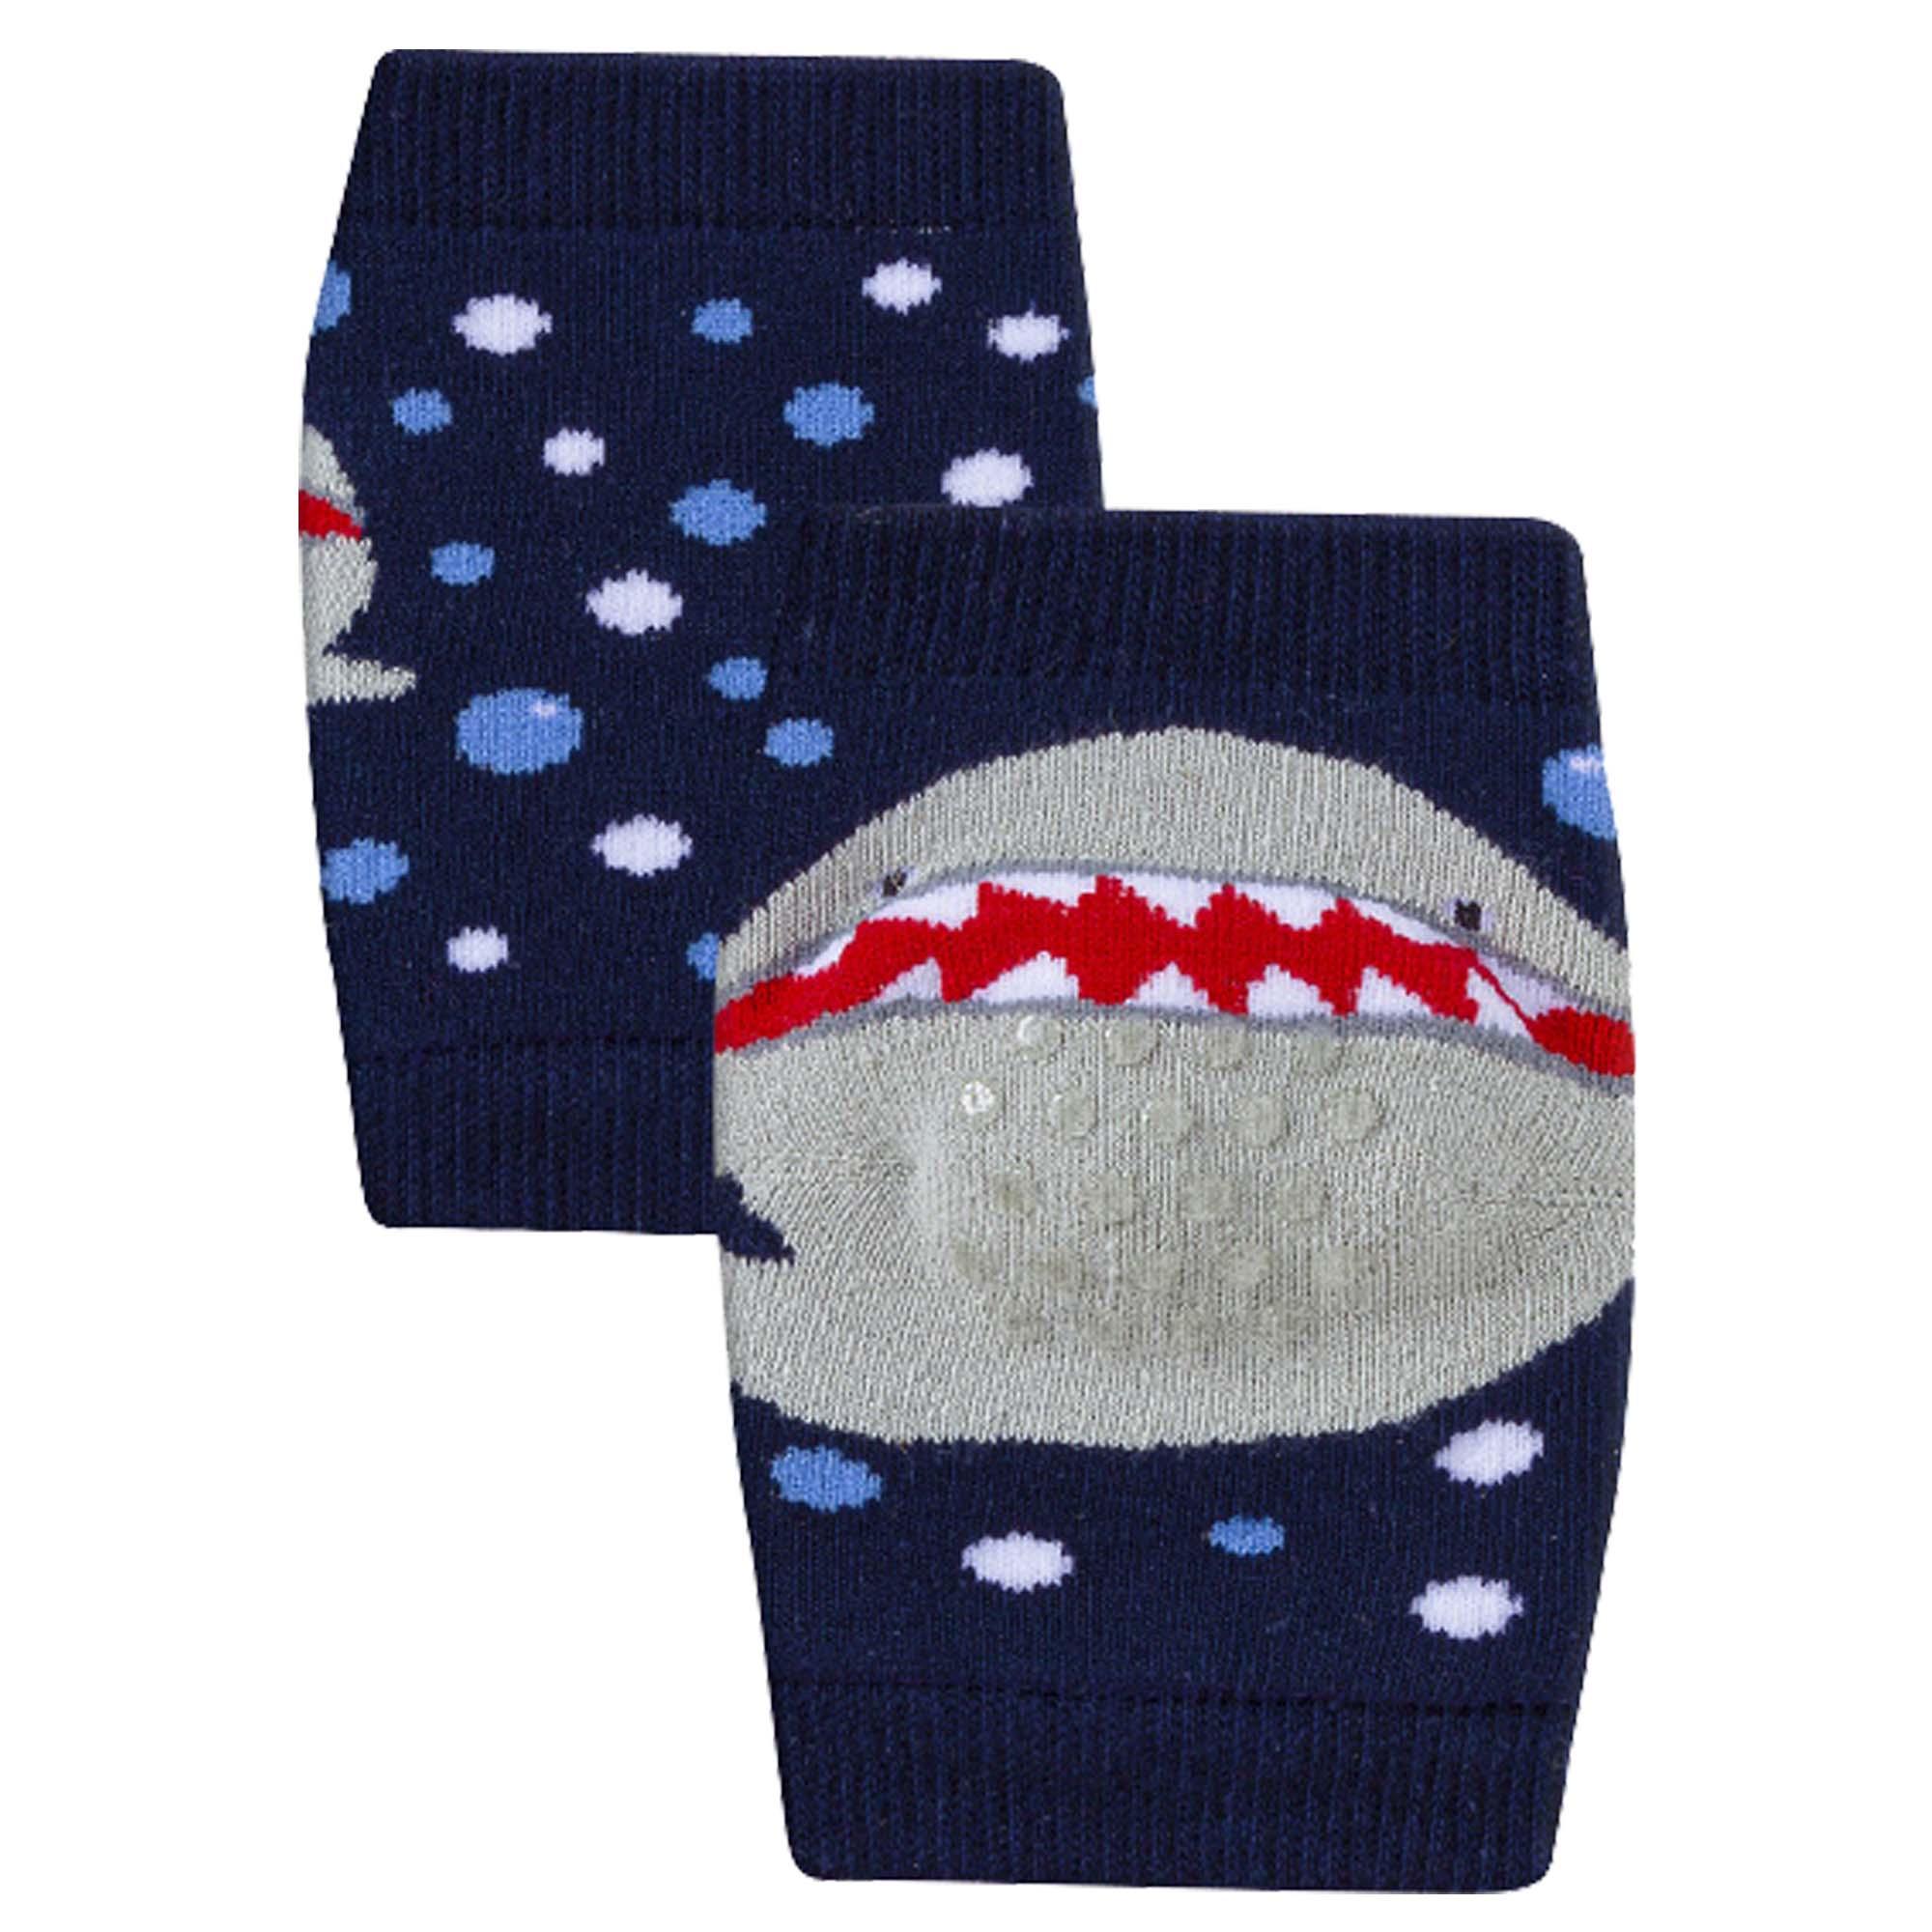 Joelheira Winston Fun Socks Bichinhos - 00 a 12 Meses